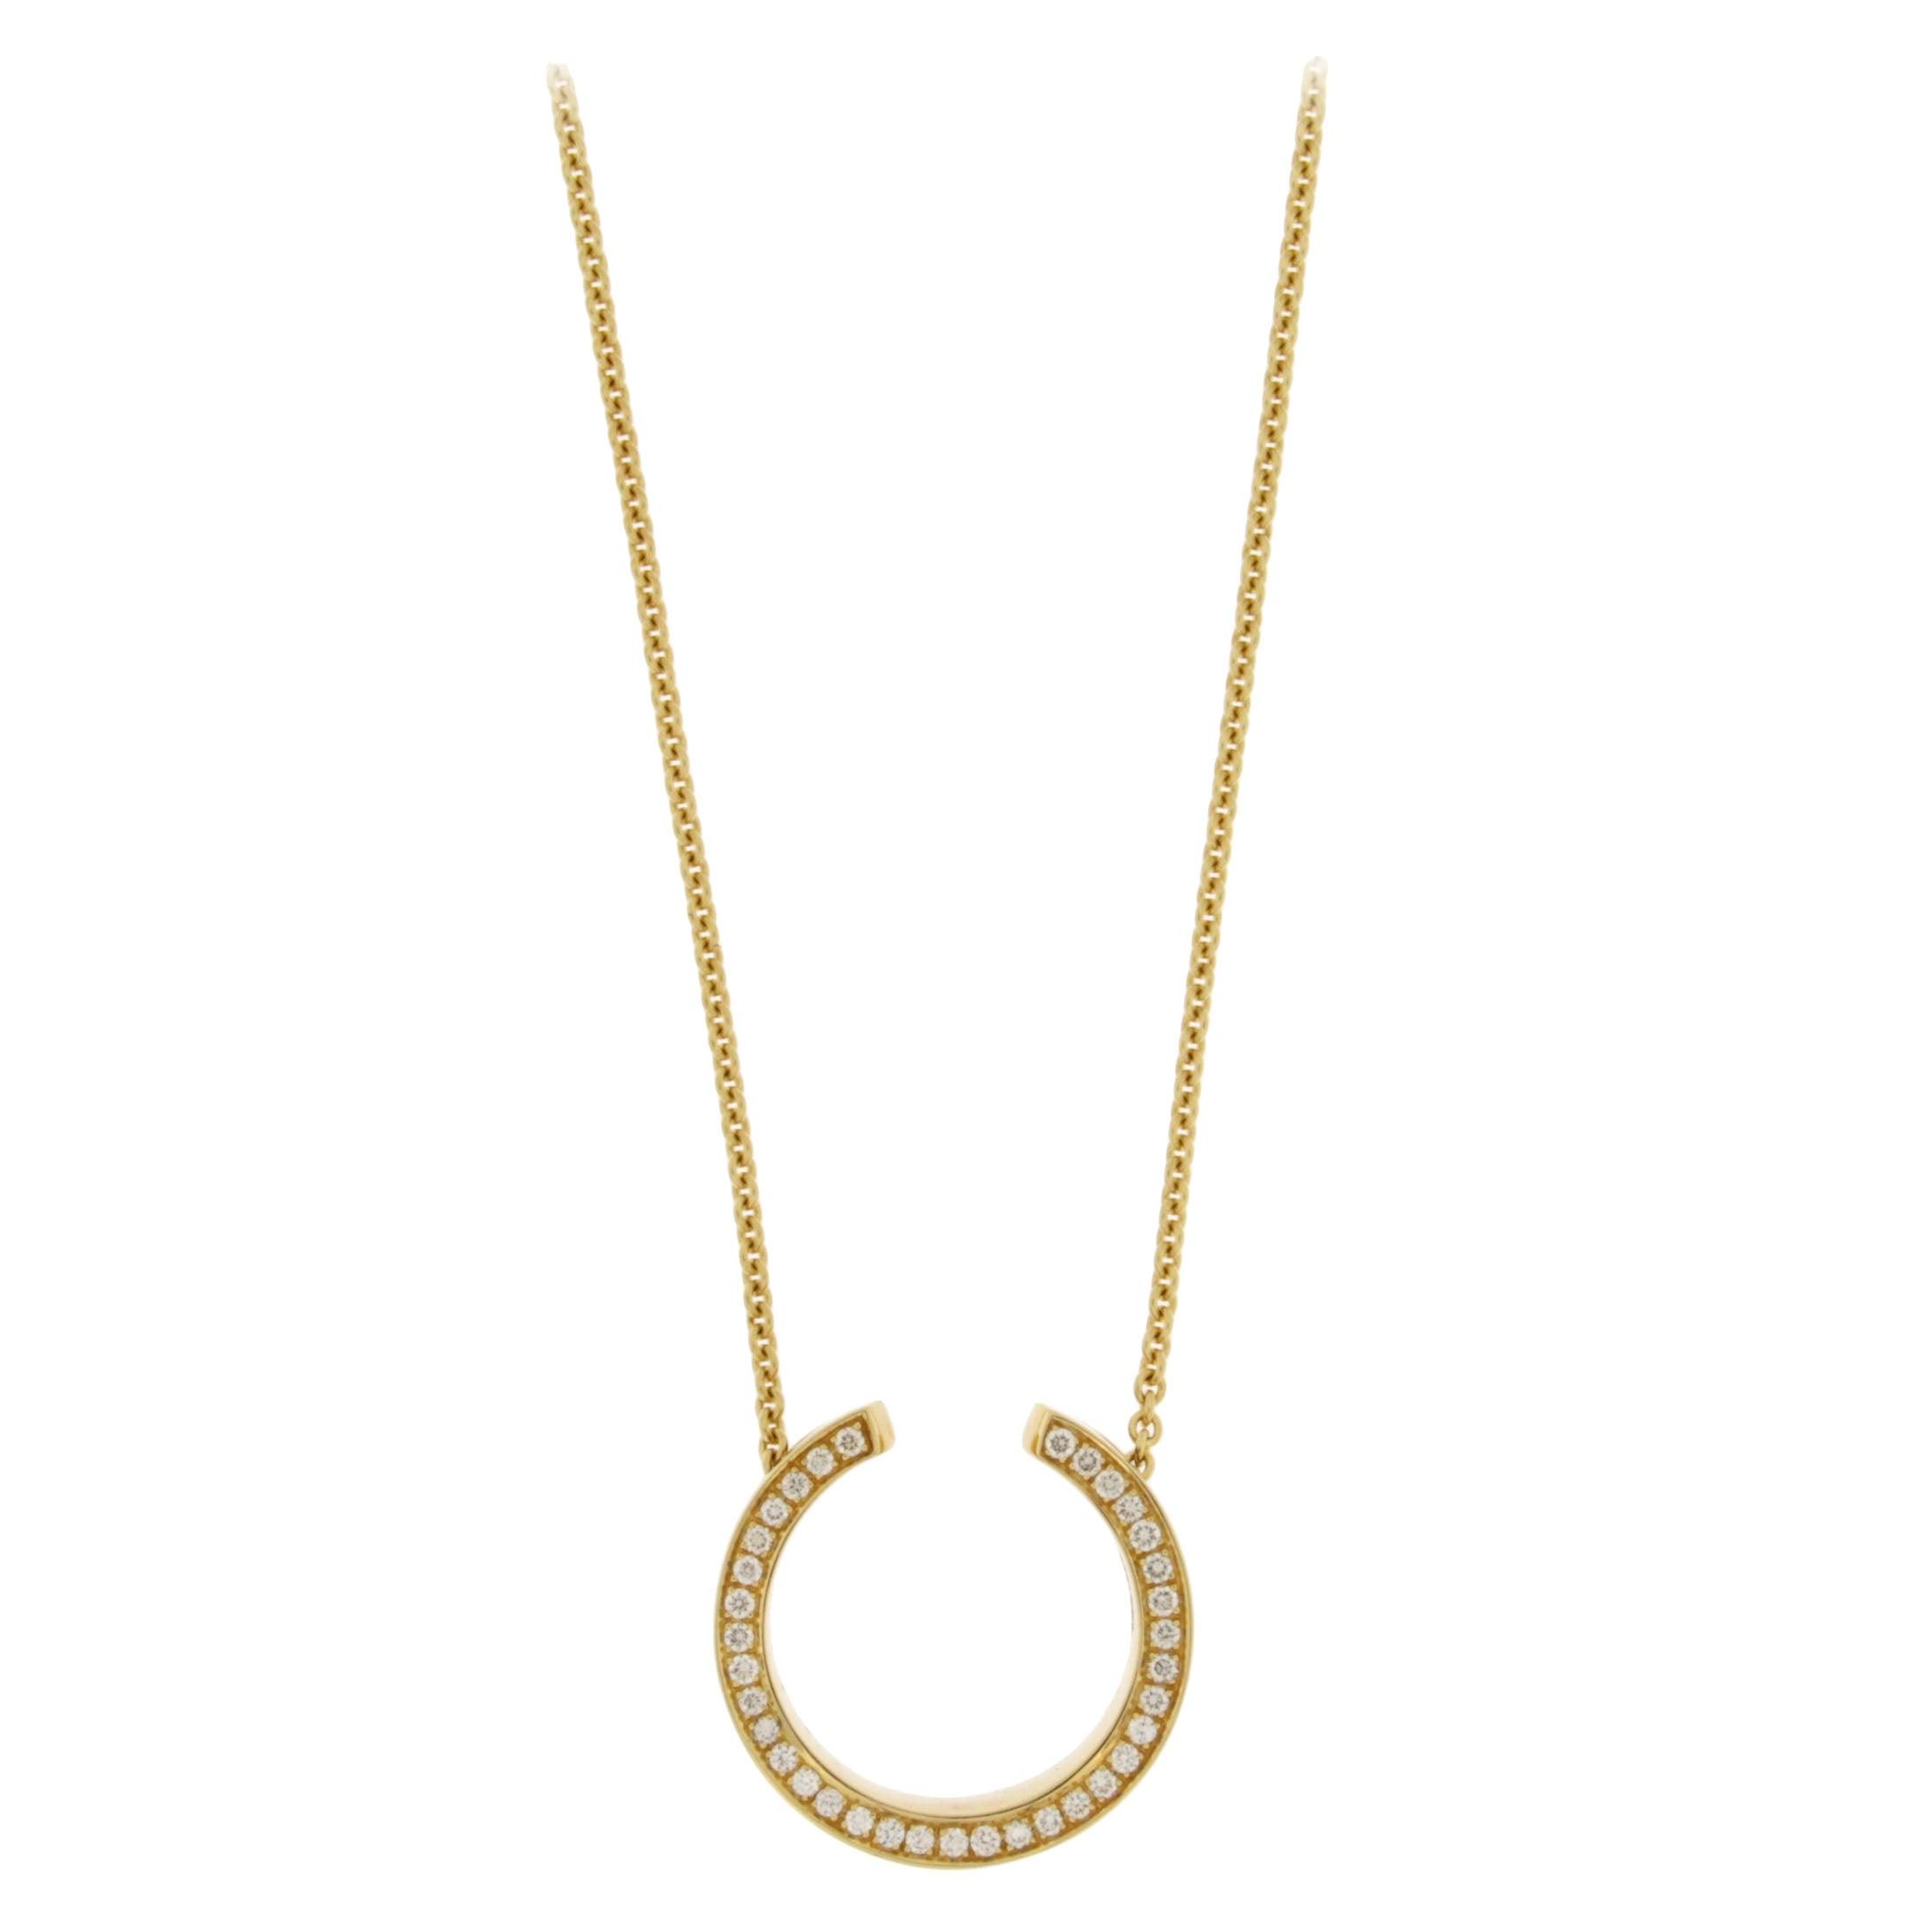 Jona White Diamond 18 karat Yellow Gold Double Sided Pendant Necklace